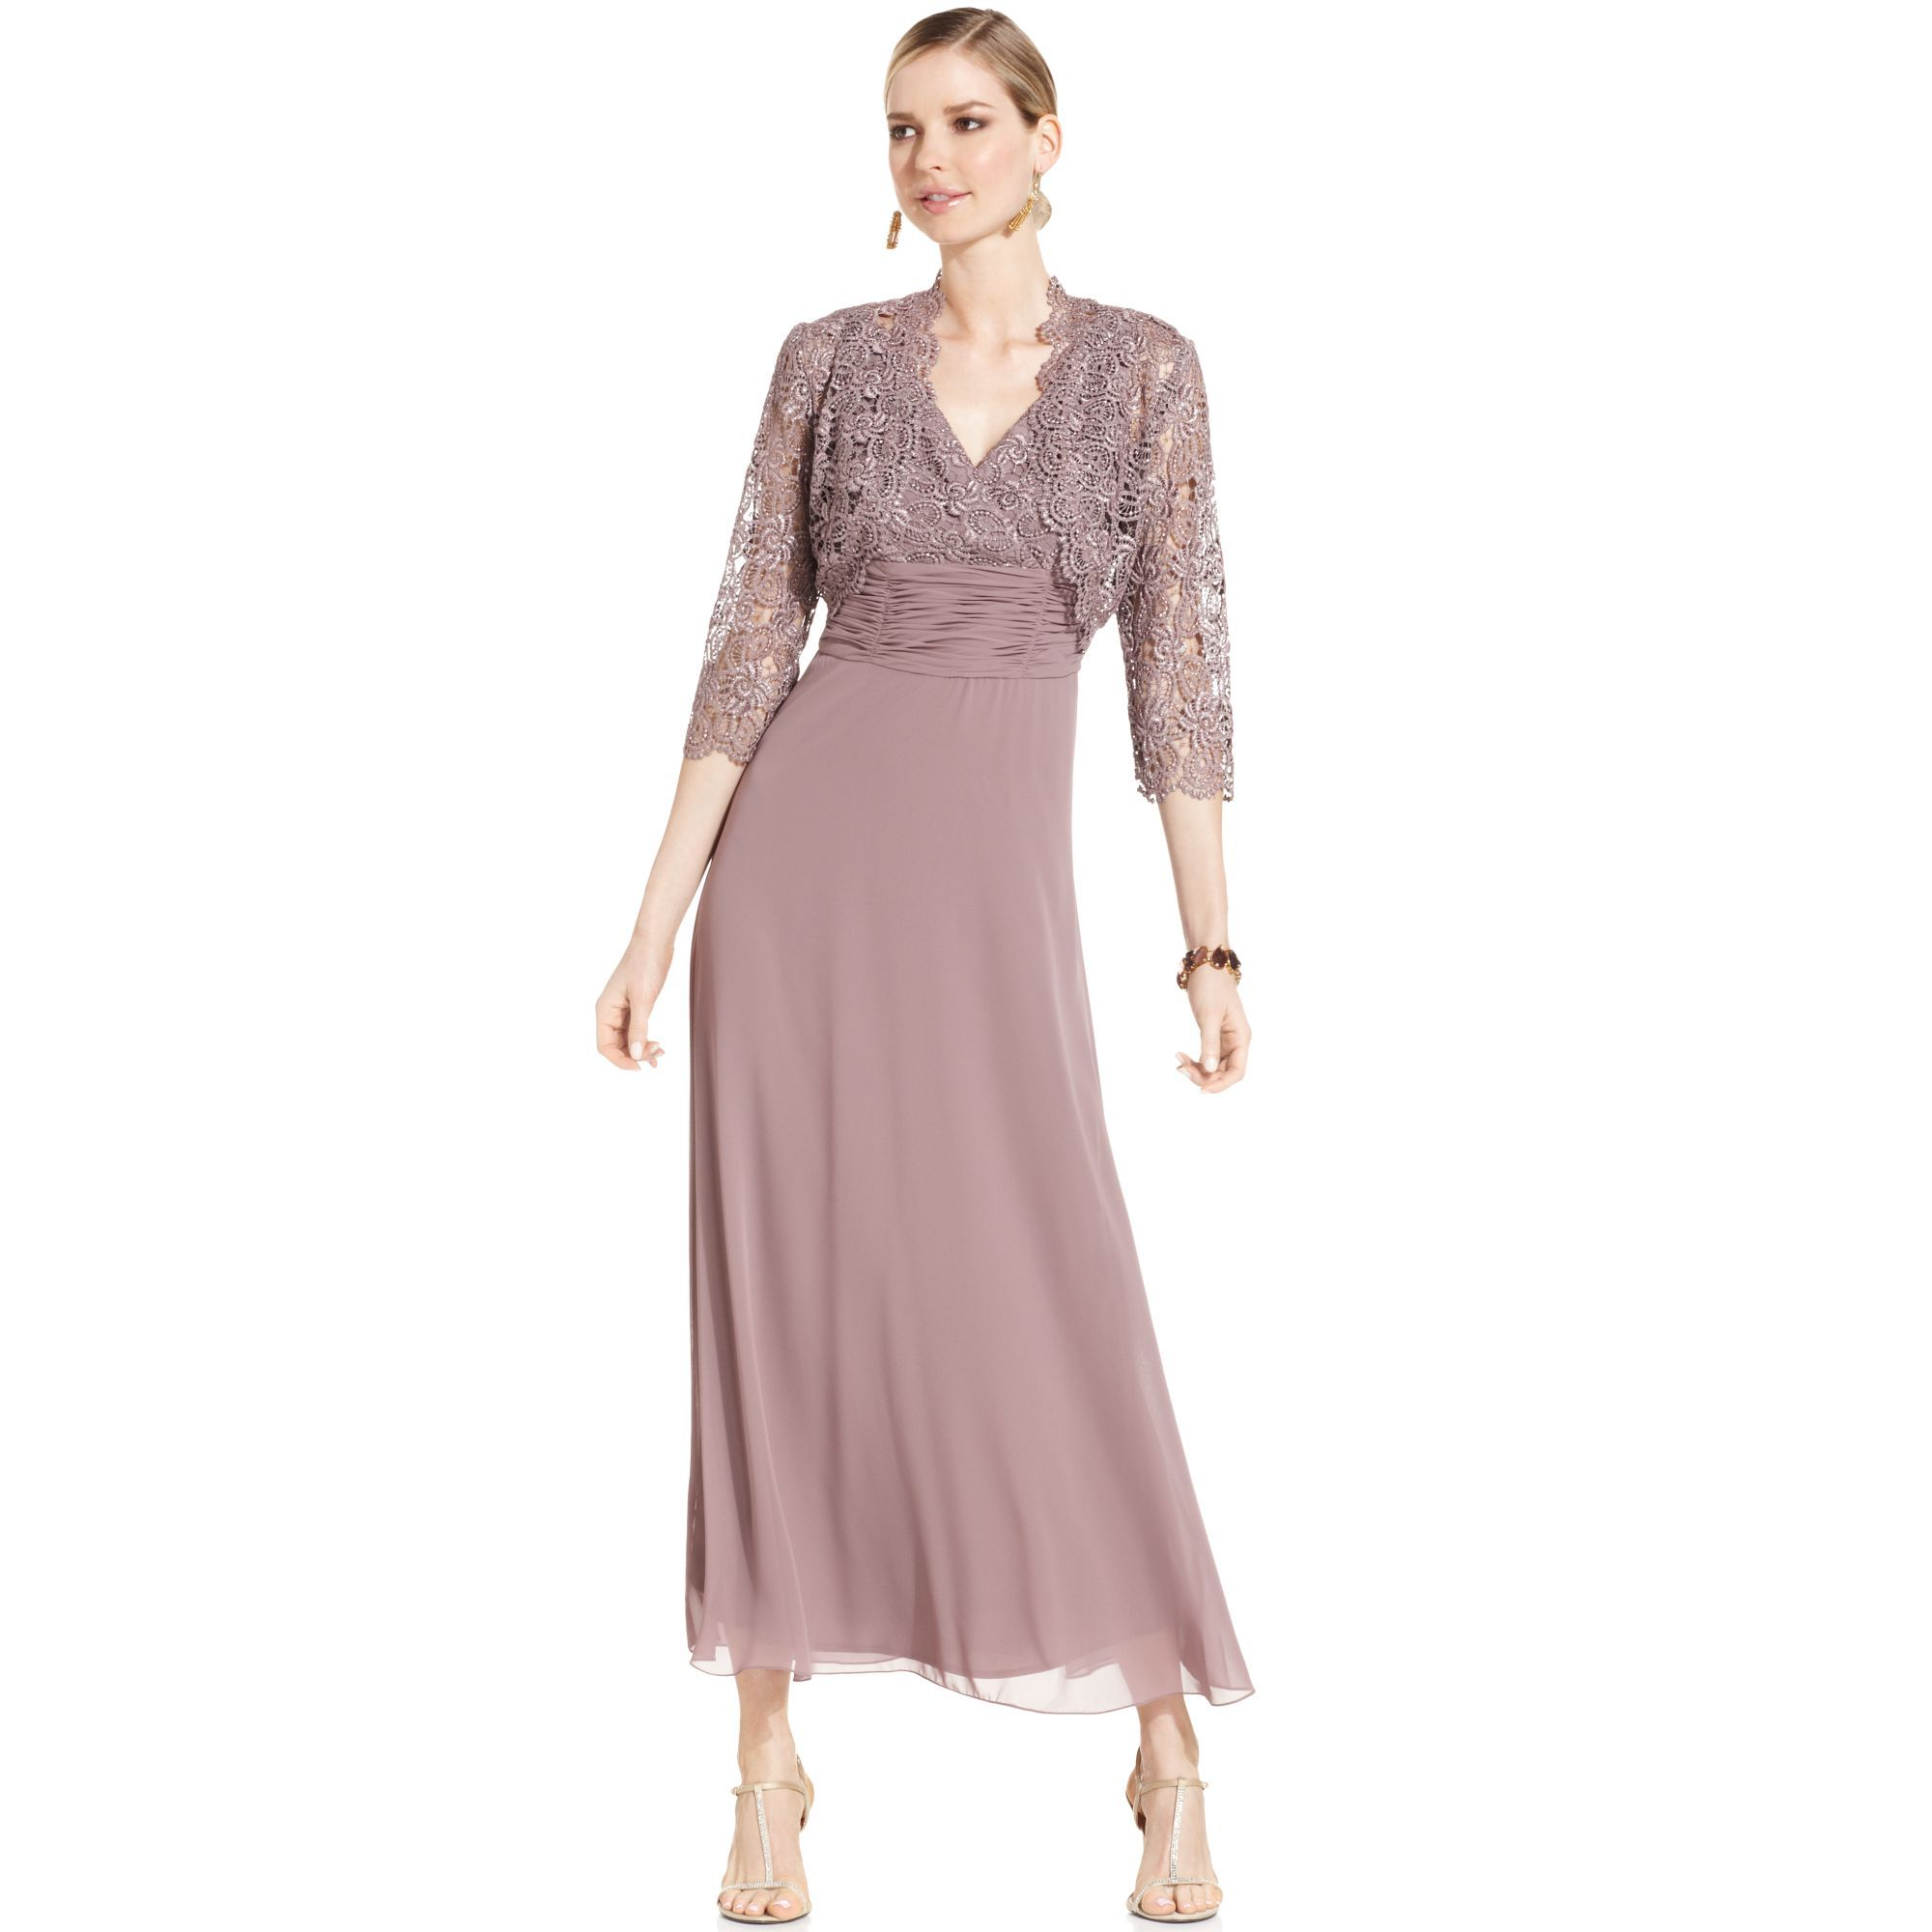 a0089eca705a4 https   www.lyst.com clothing patra-sleeveless-lace-gown-mocha ...